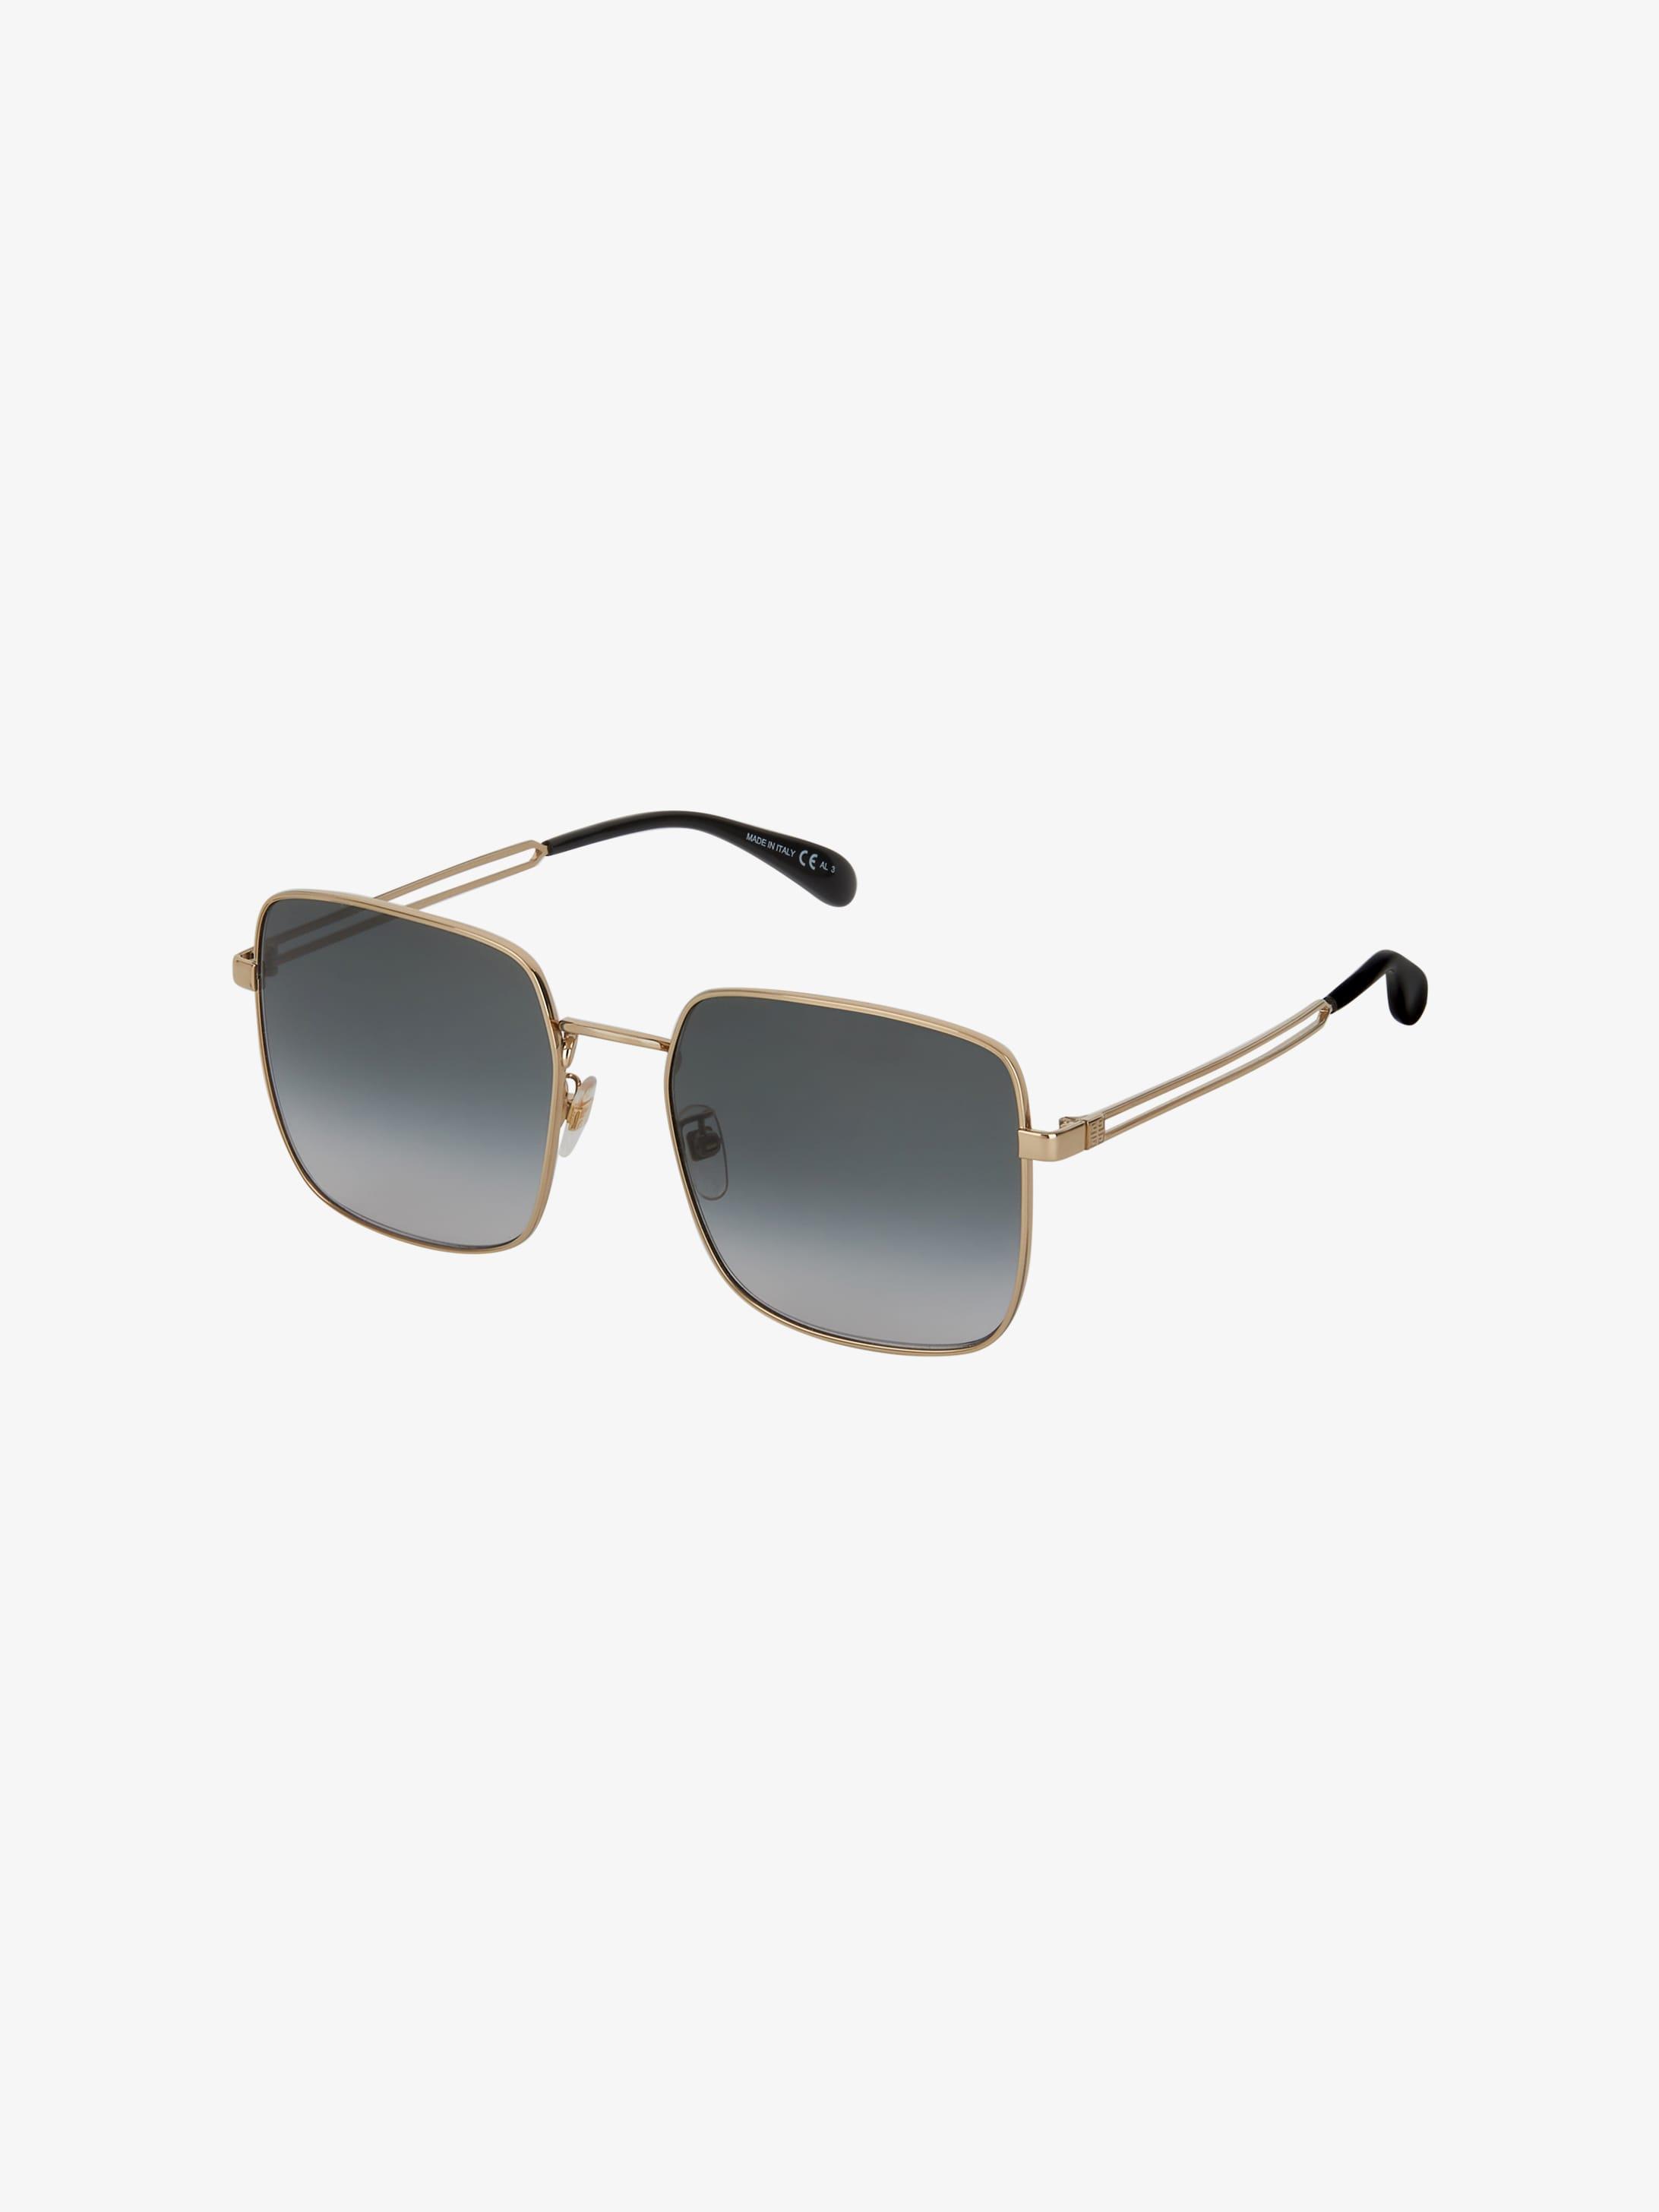 GV Double Wire sunglasses in metal